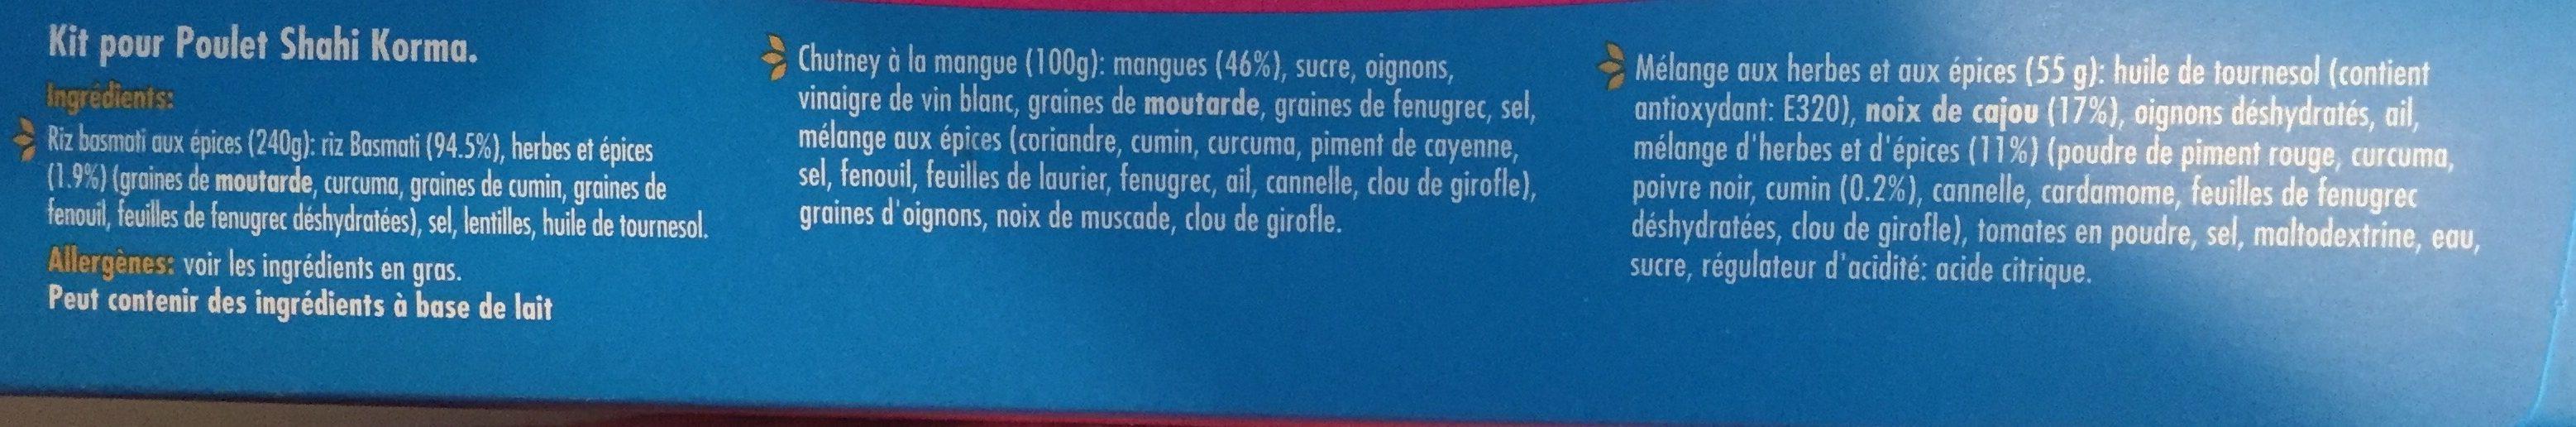 Kit pour poulet shah korma - Ingredients - fr